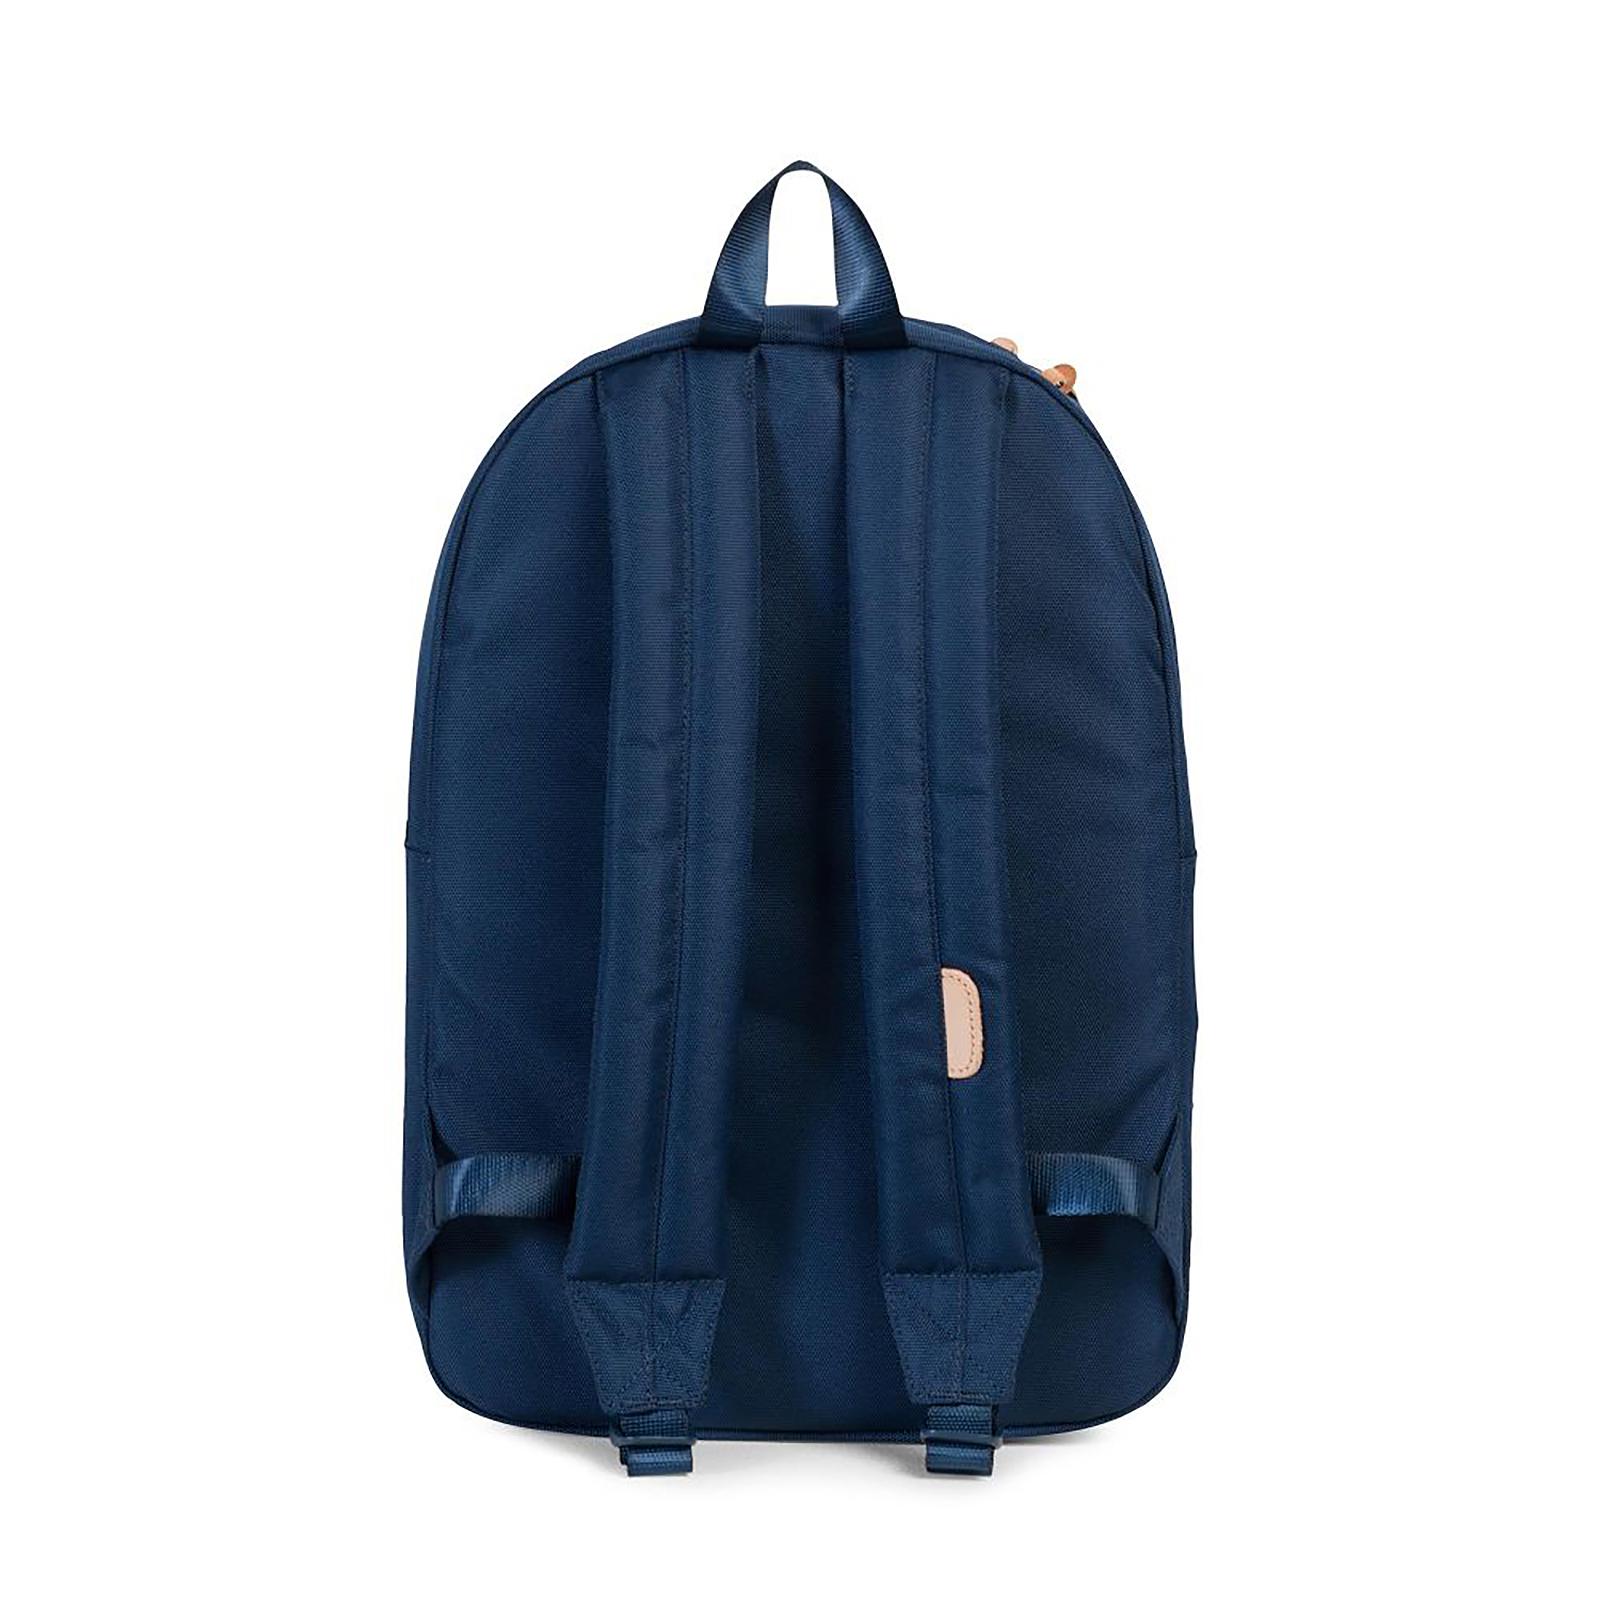 bef7c772dd3 Herschel-Backpacks-Winlaw-Cordura-Navy-Blue thumbnail 4